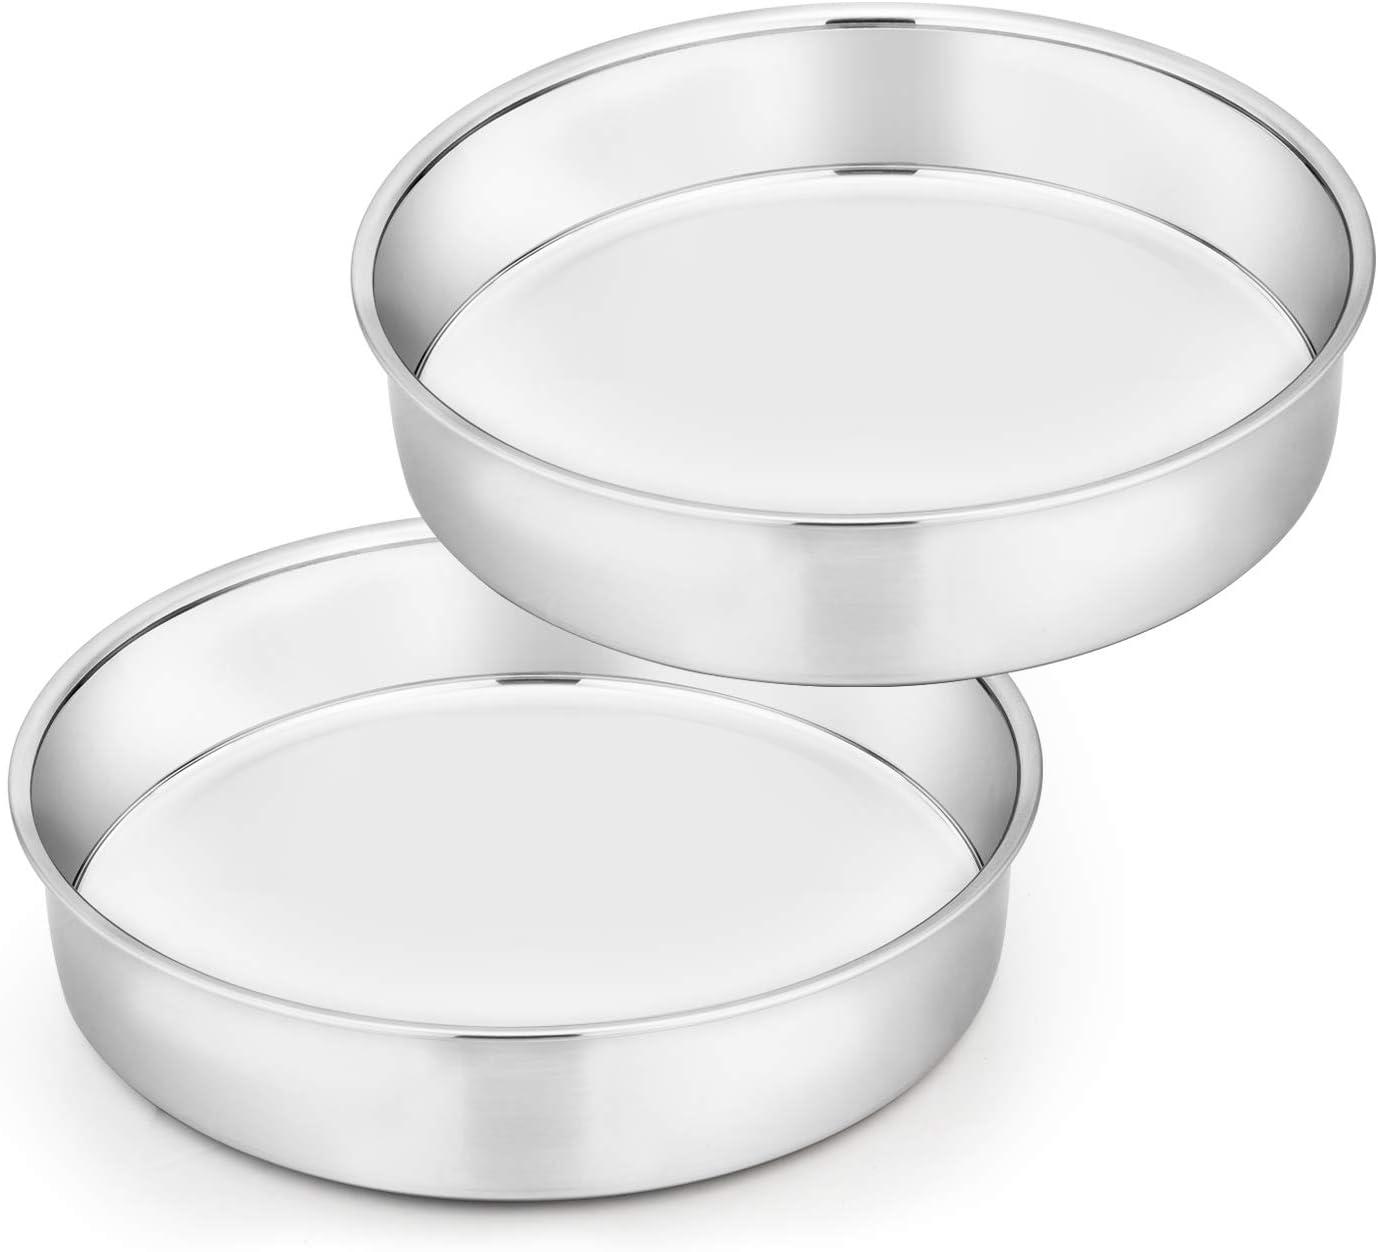 TeamFar Cake Pan Set of 2, 8 Inch Cake Pan Round Tier Cake Pan Set Stainless Steel, Healthy & Heavy Duty, Mirror Finish & Easy Clean, Dishwasher Safe